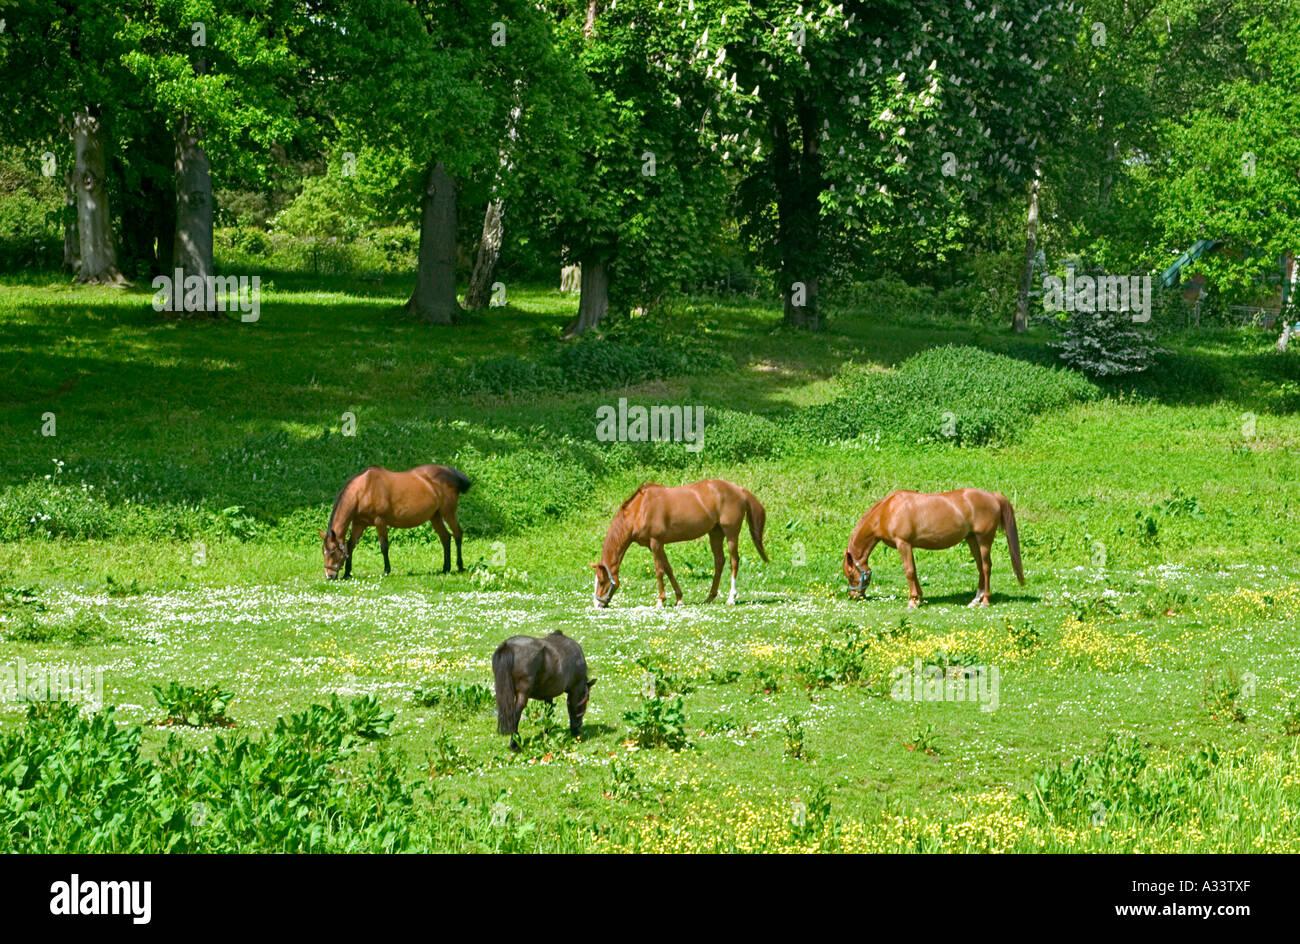 Horses in a Forest Meadow Gunderslevholm Zealand Denmark - Stock Image